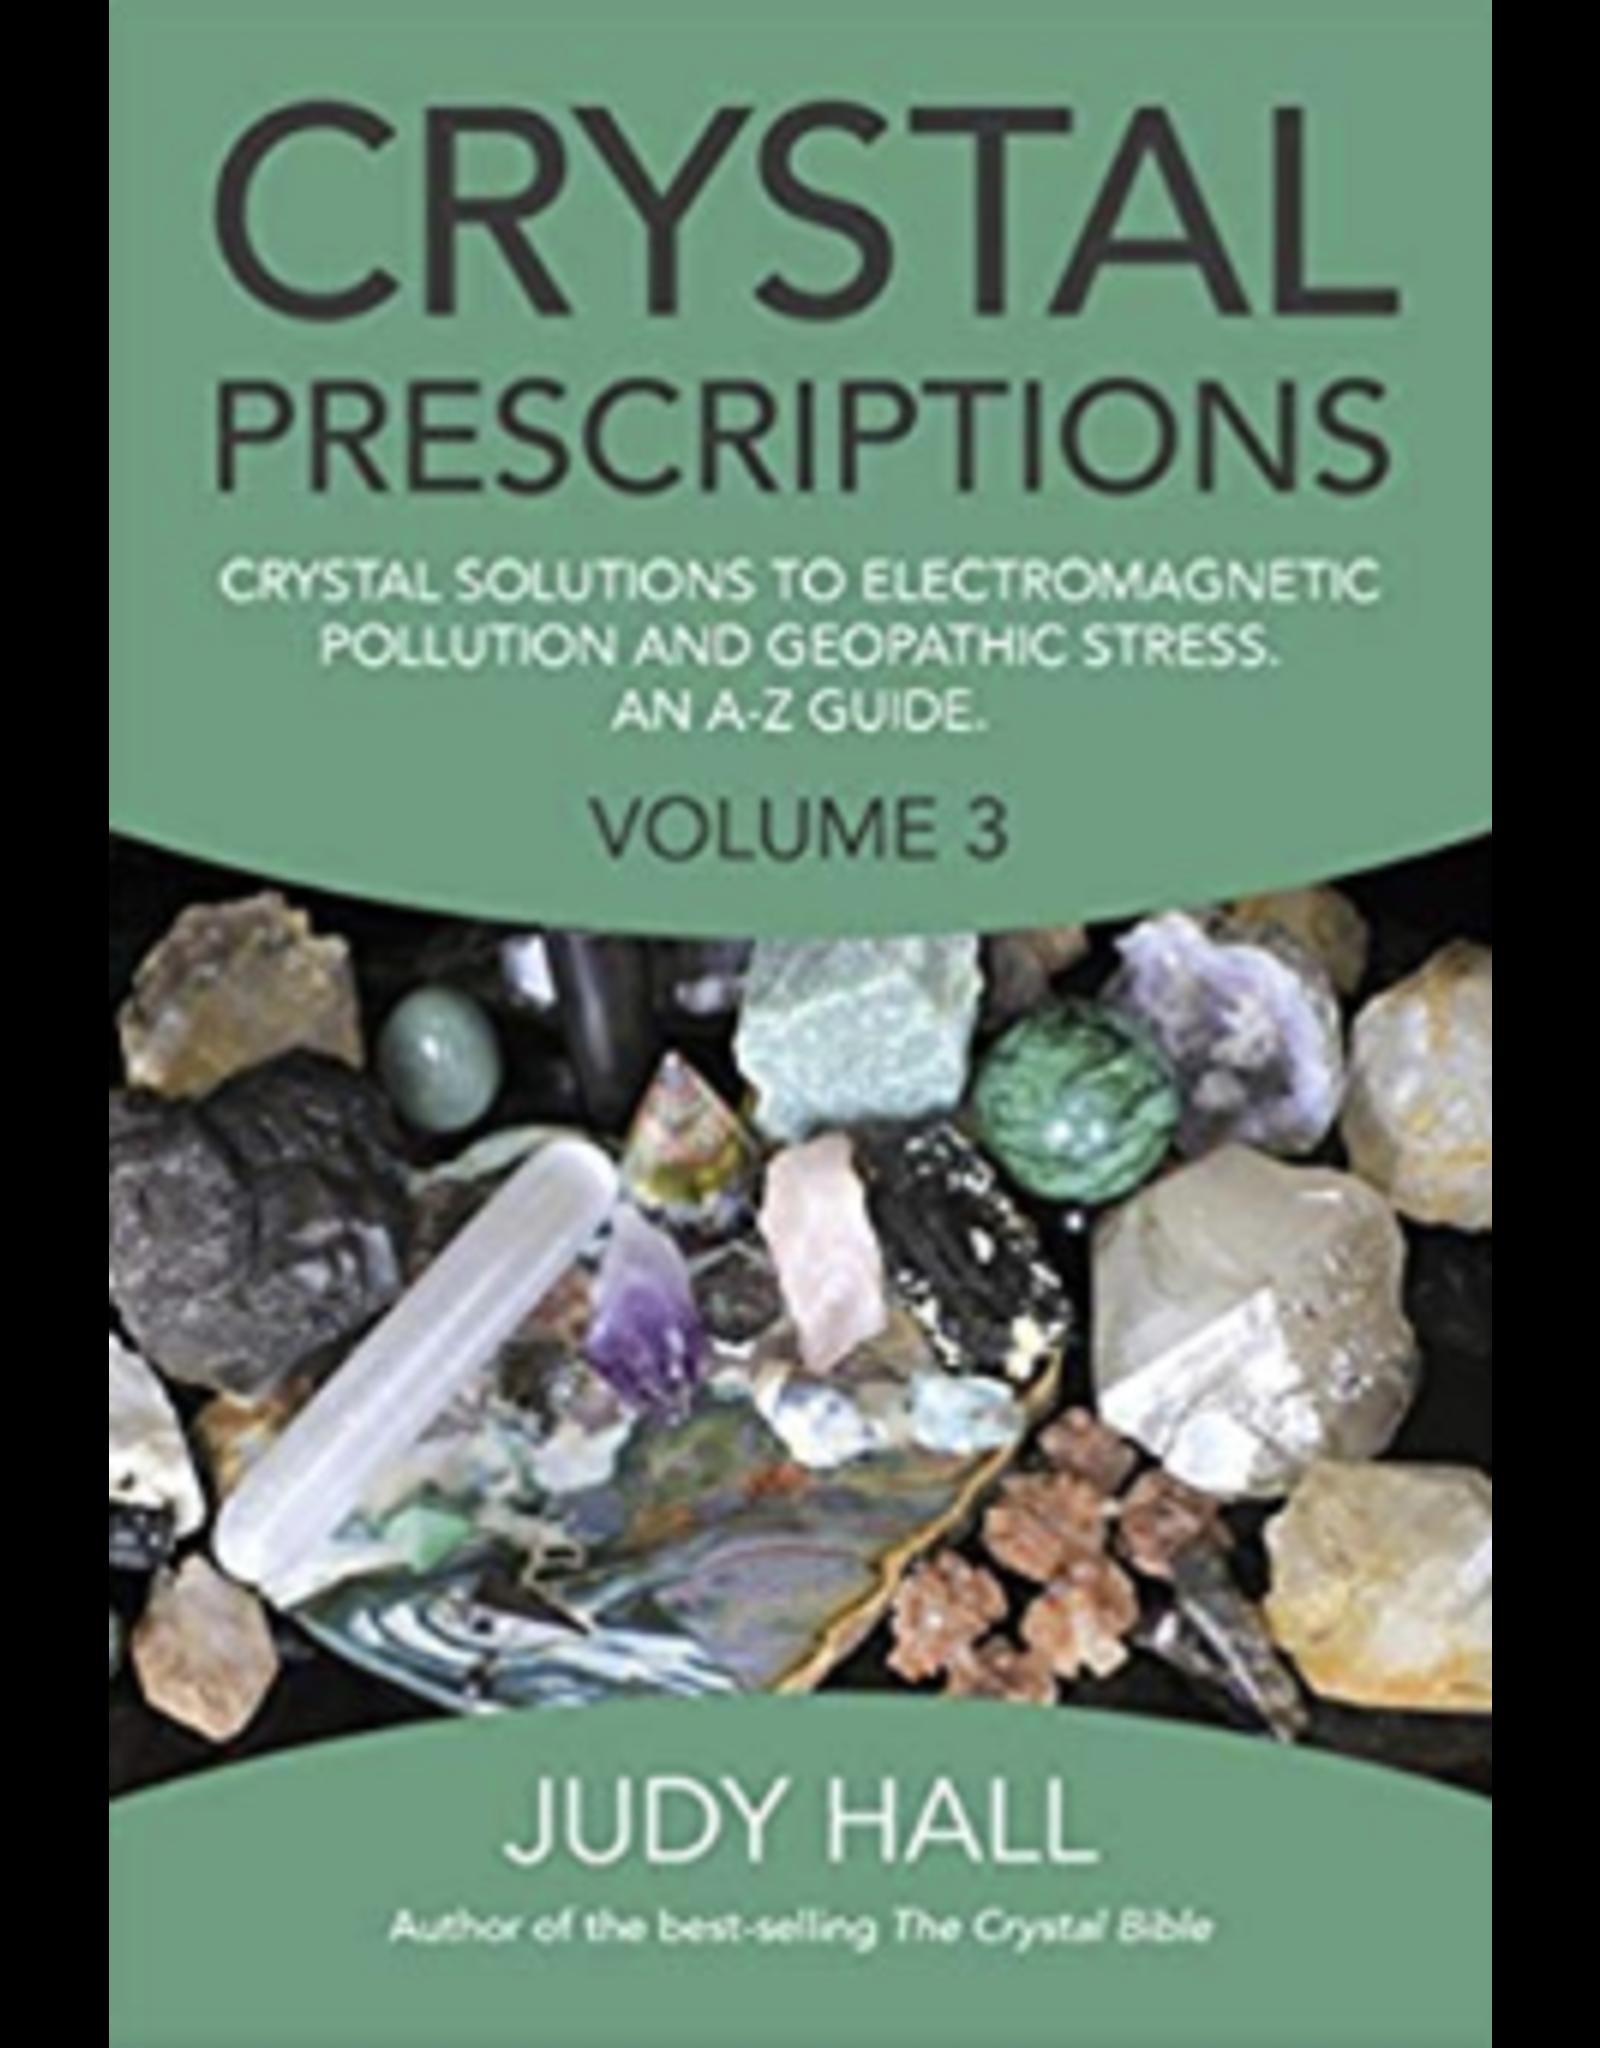 Crystal Prescriptions Volume 3